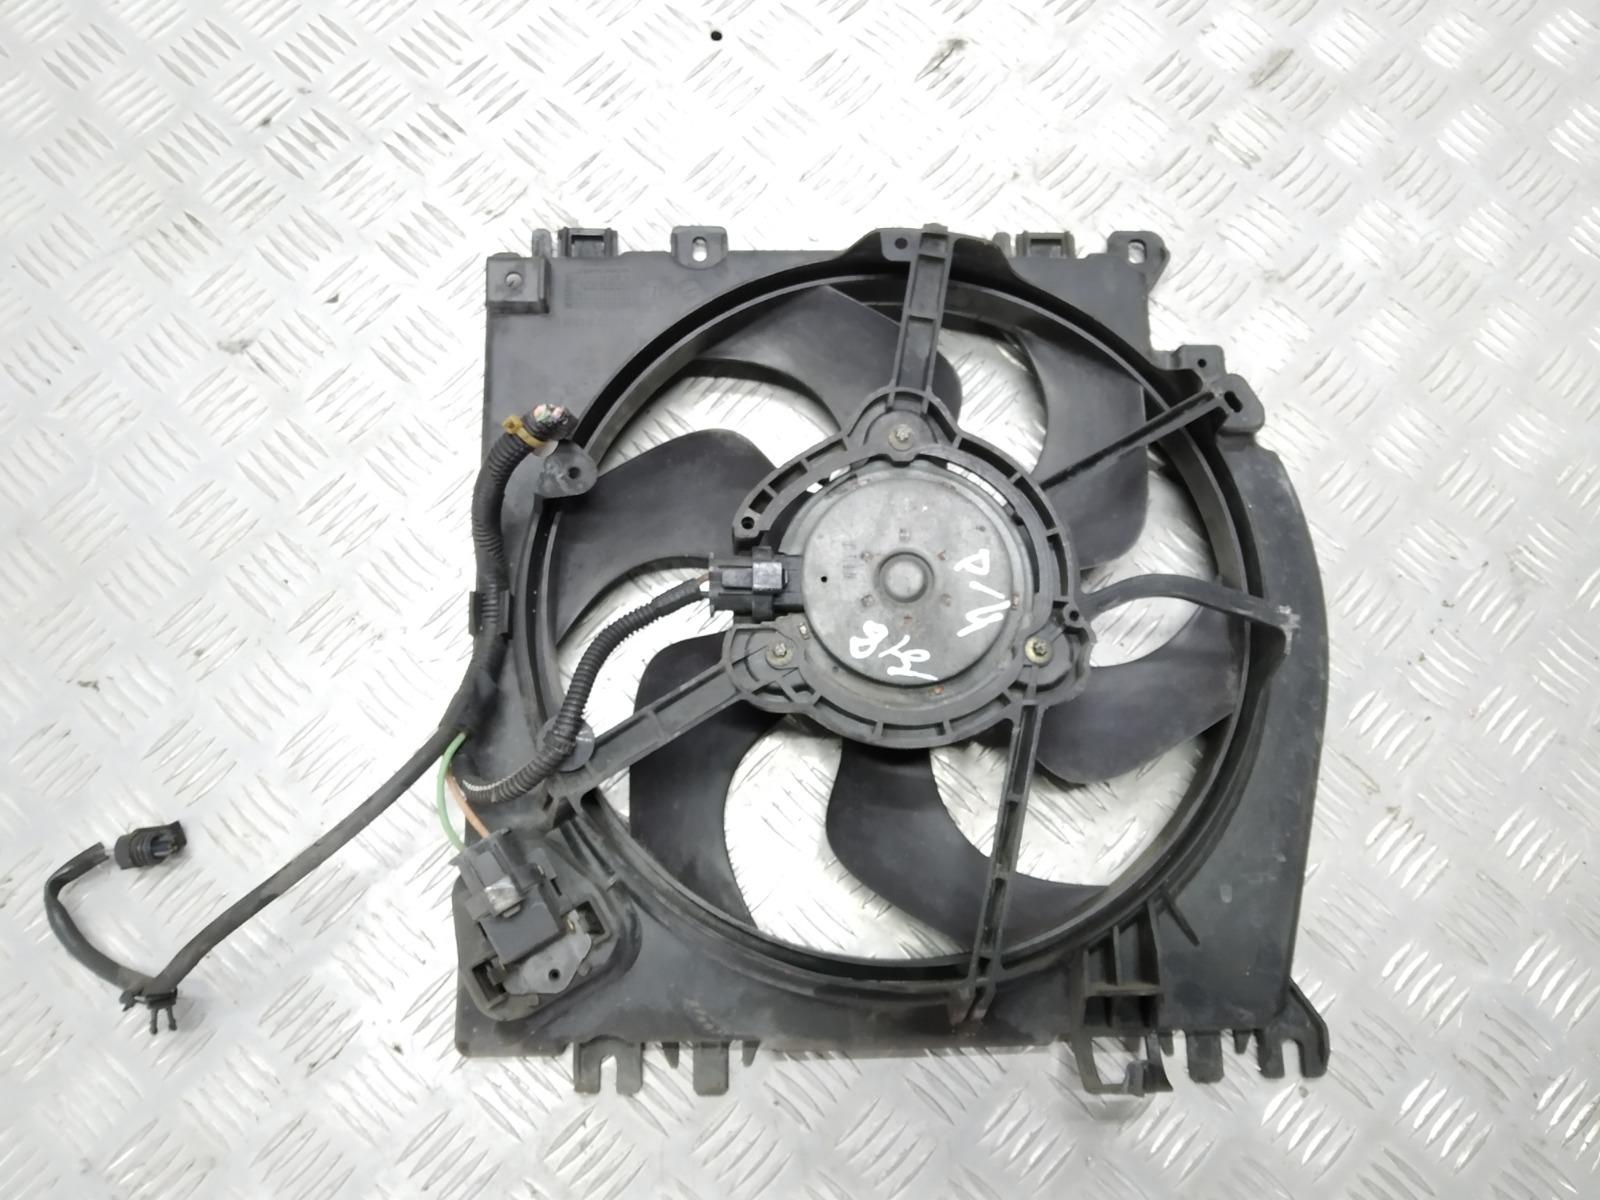 Вентилятор радиатора Renault Modus 1.5 DCI 2005 (б/у)